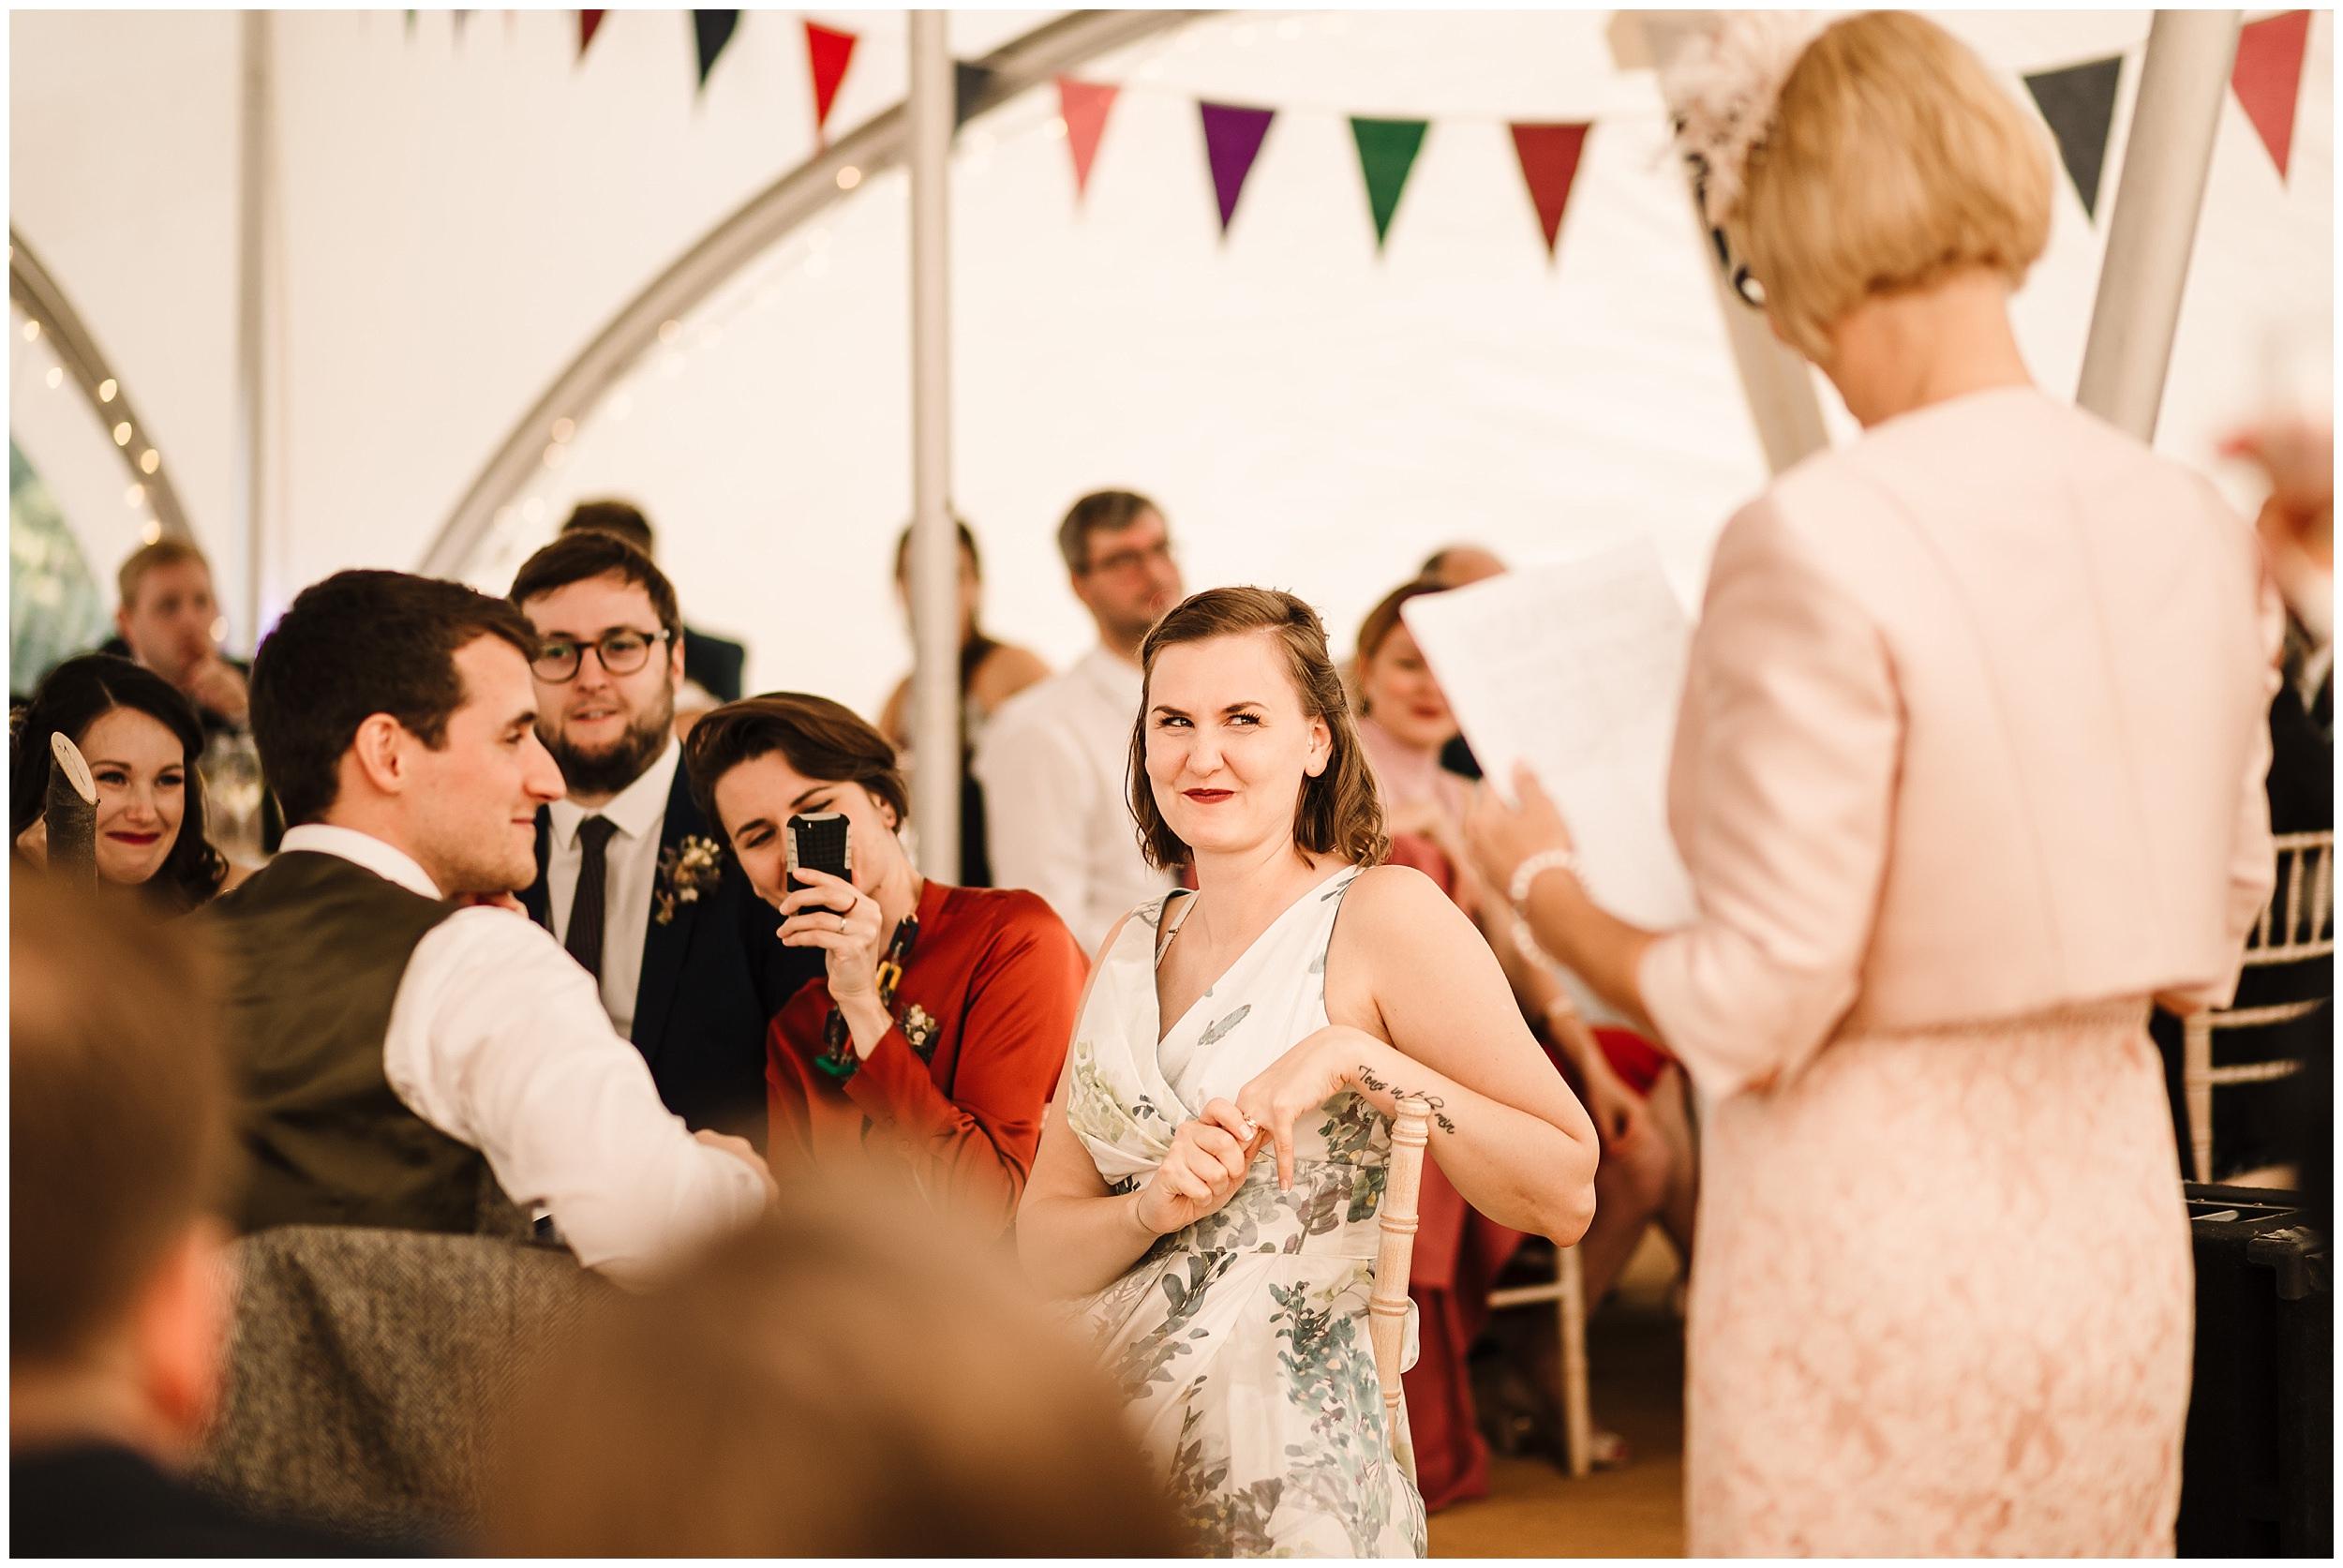 YORKSHIRE OUTDOOR WEDDING PHOTOGRAPHER LUCY ALEX_0032.jpg